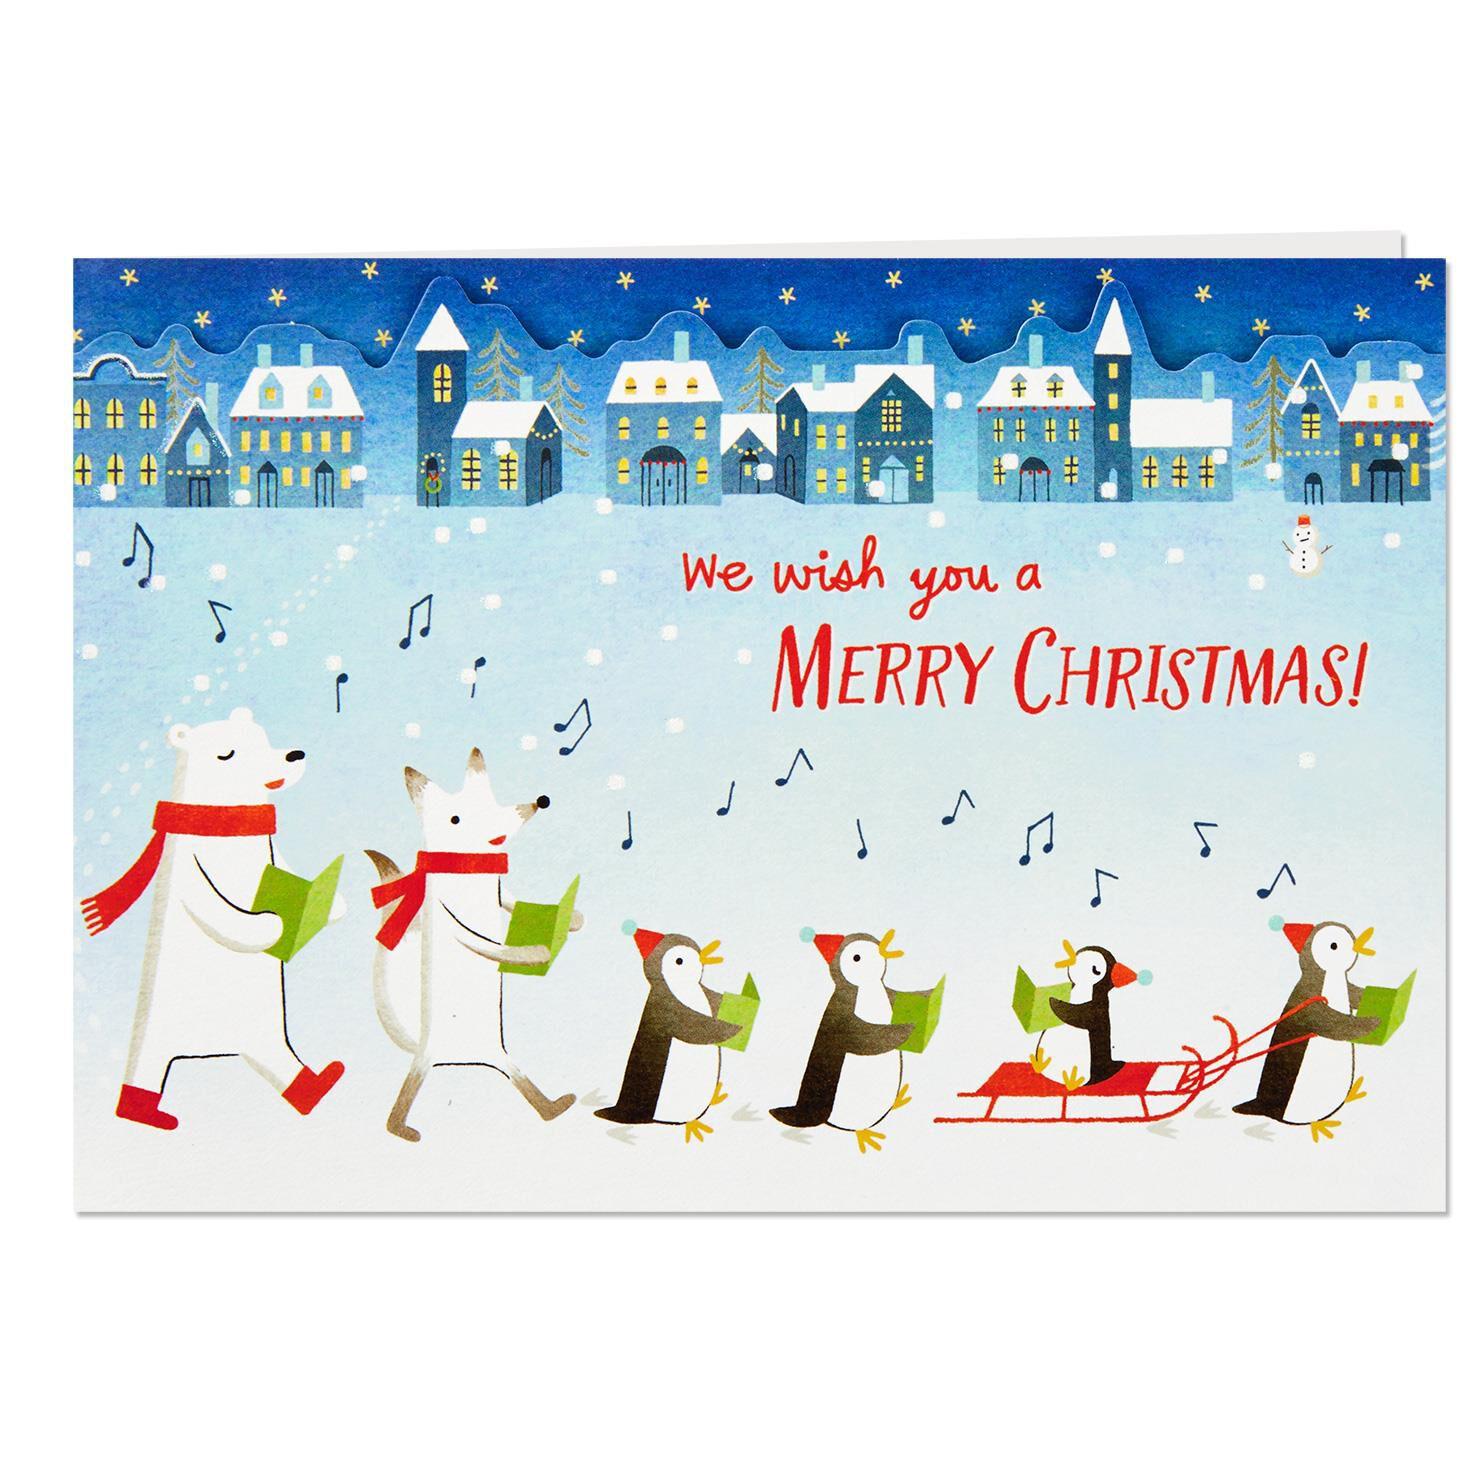 Merry Christmas Greetings.We Wish You A Merry Christmas Caroling Animals Pop Up Christmas Card